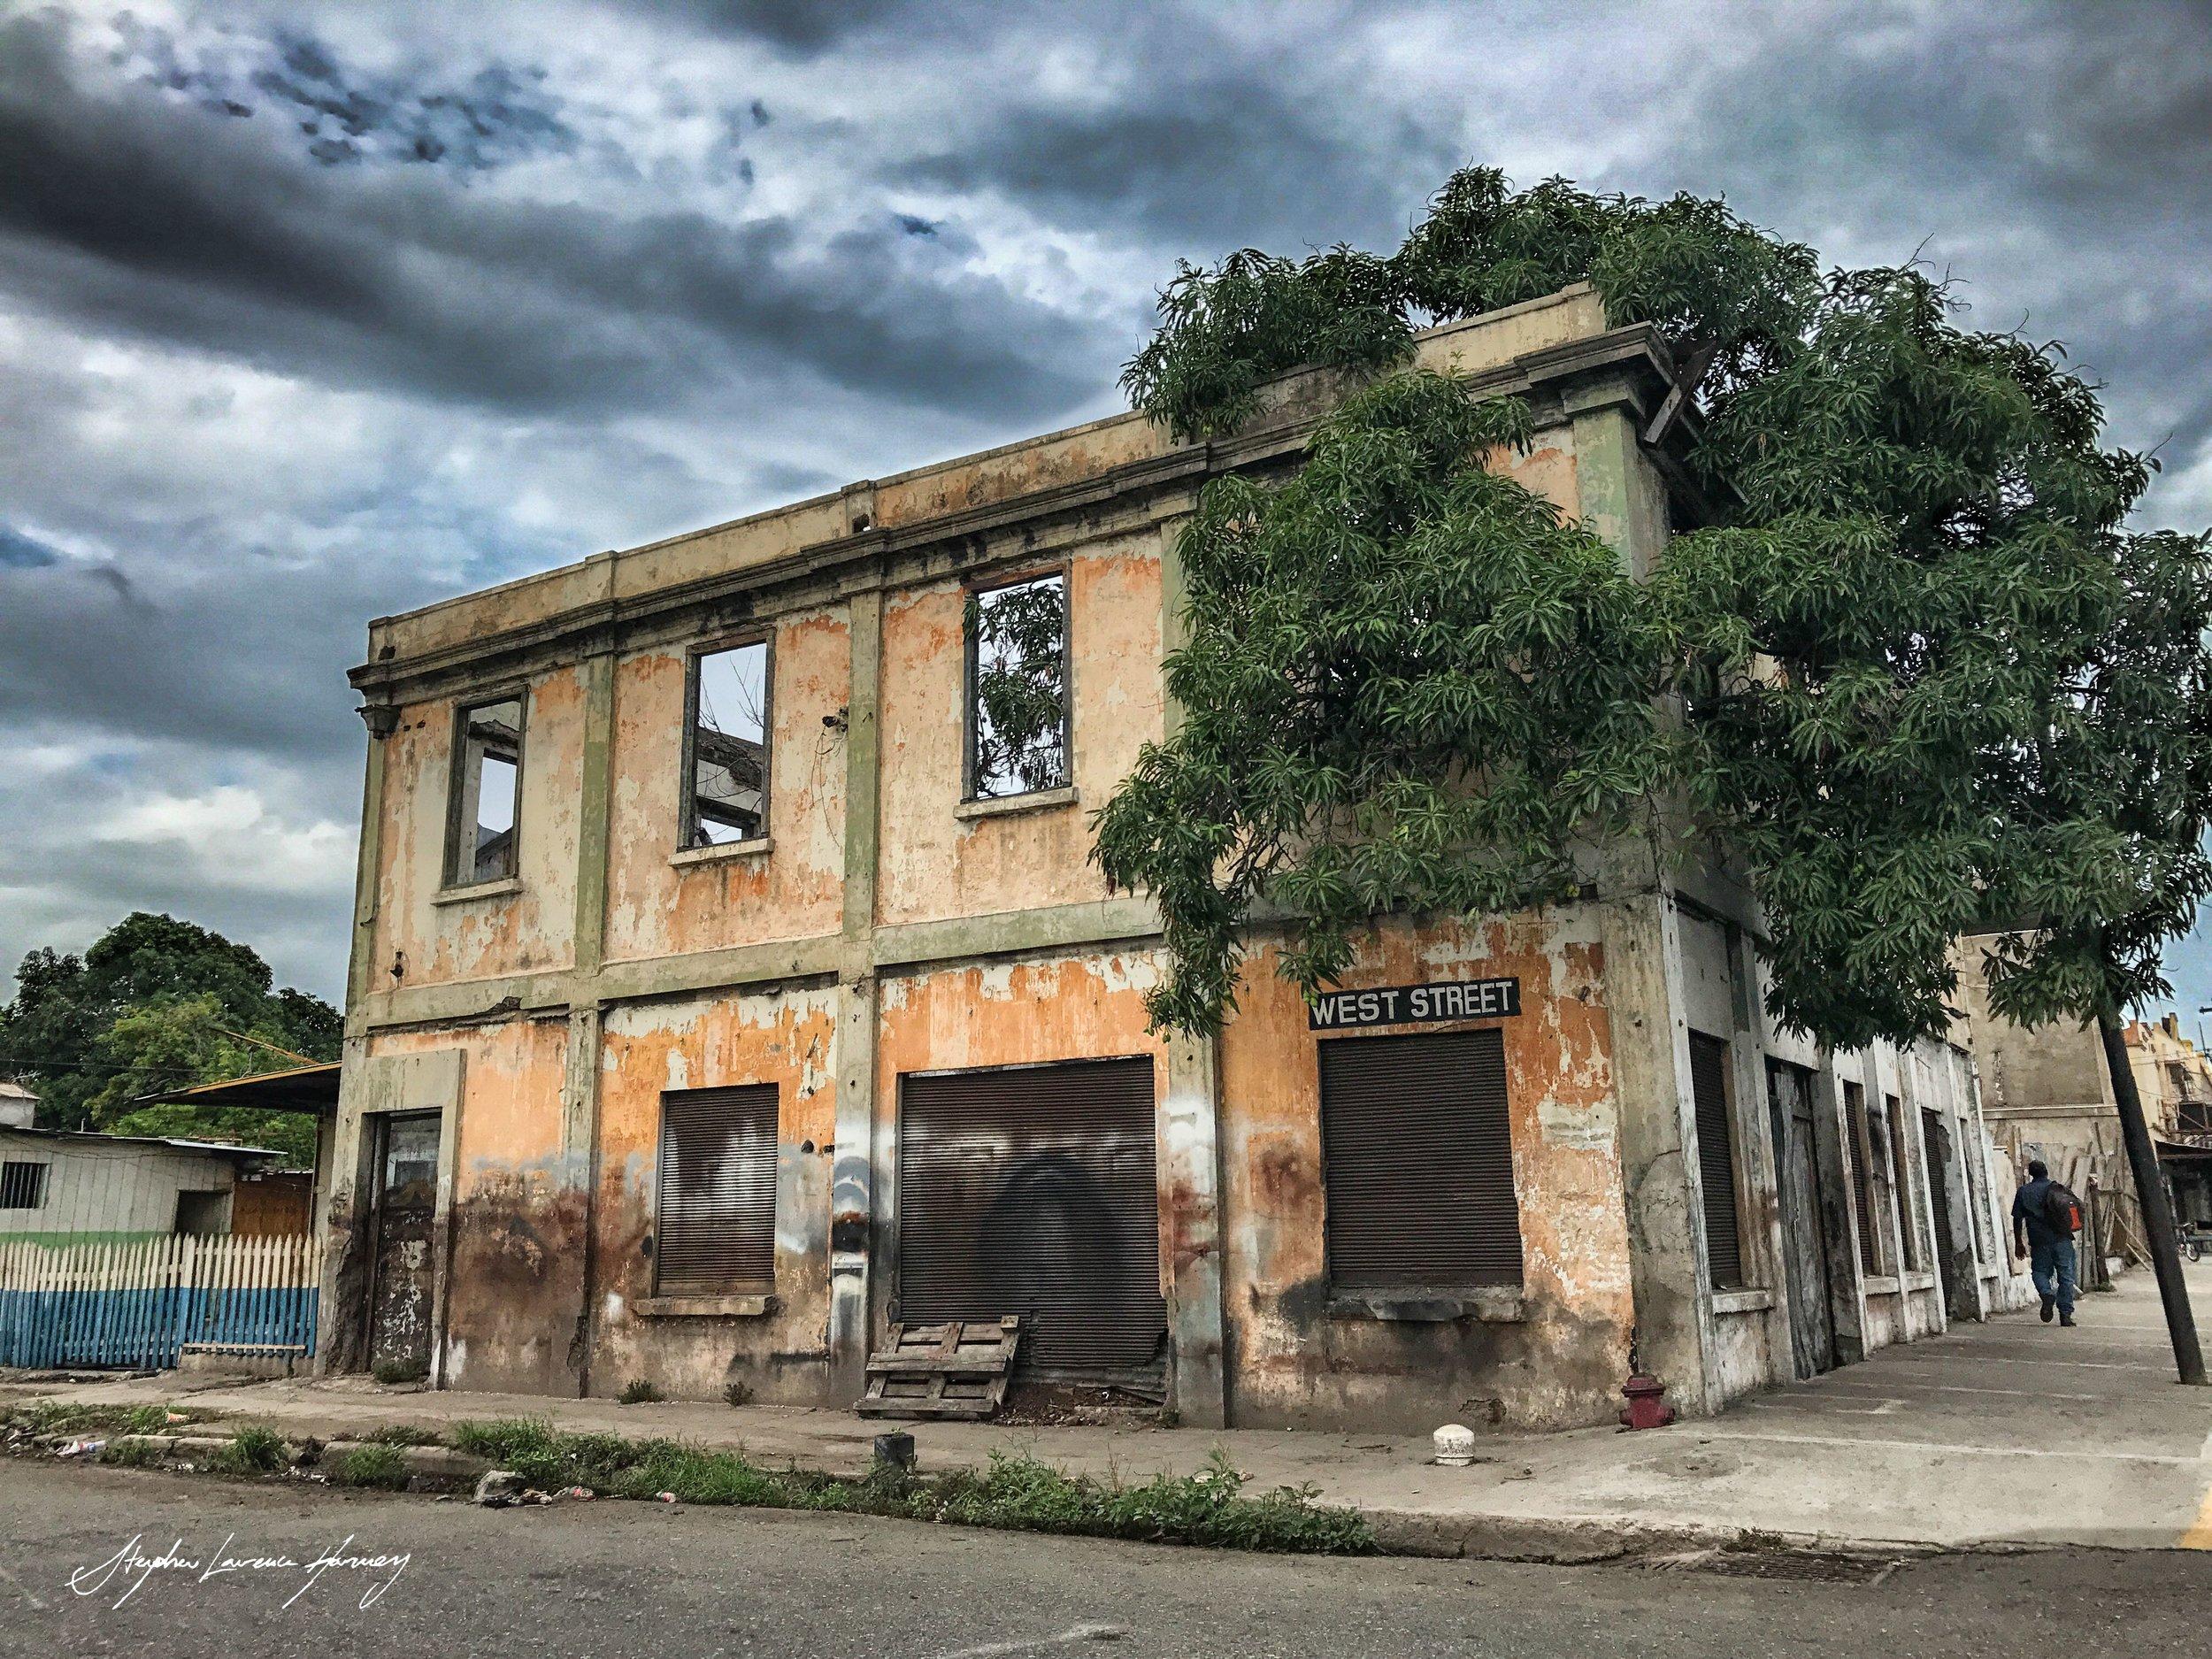 Jamaica Kinston building  (1 of 1) copy.jpg